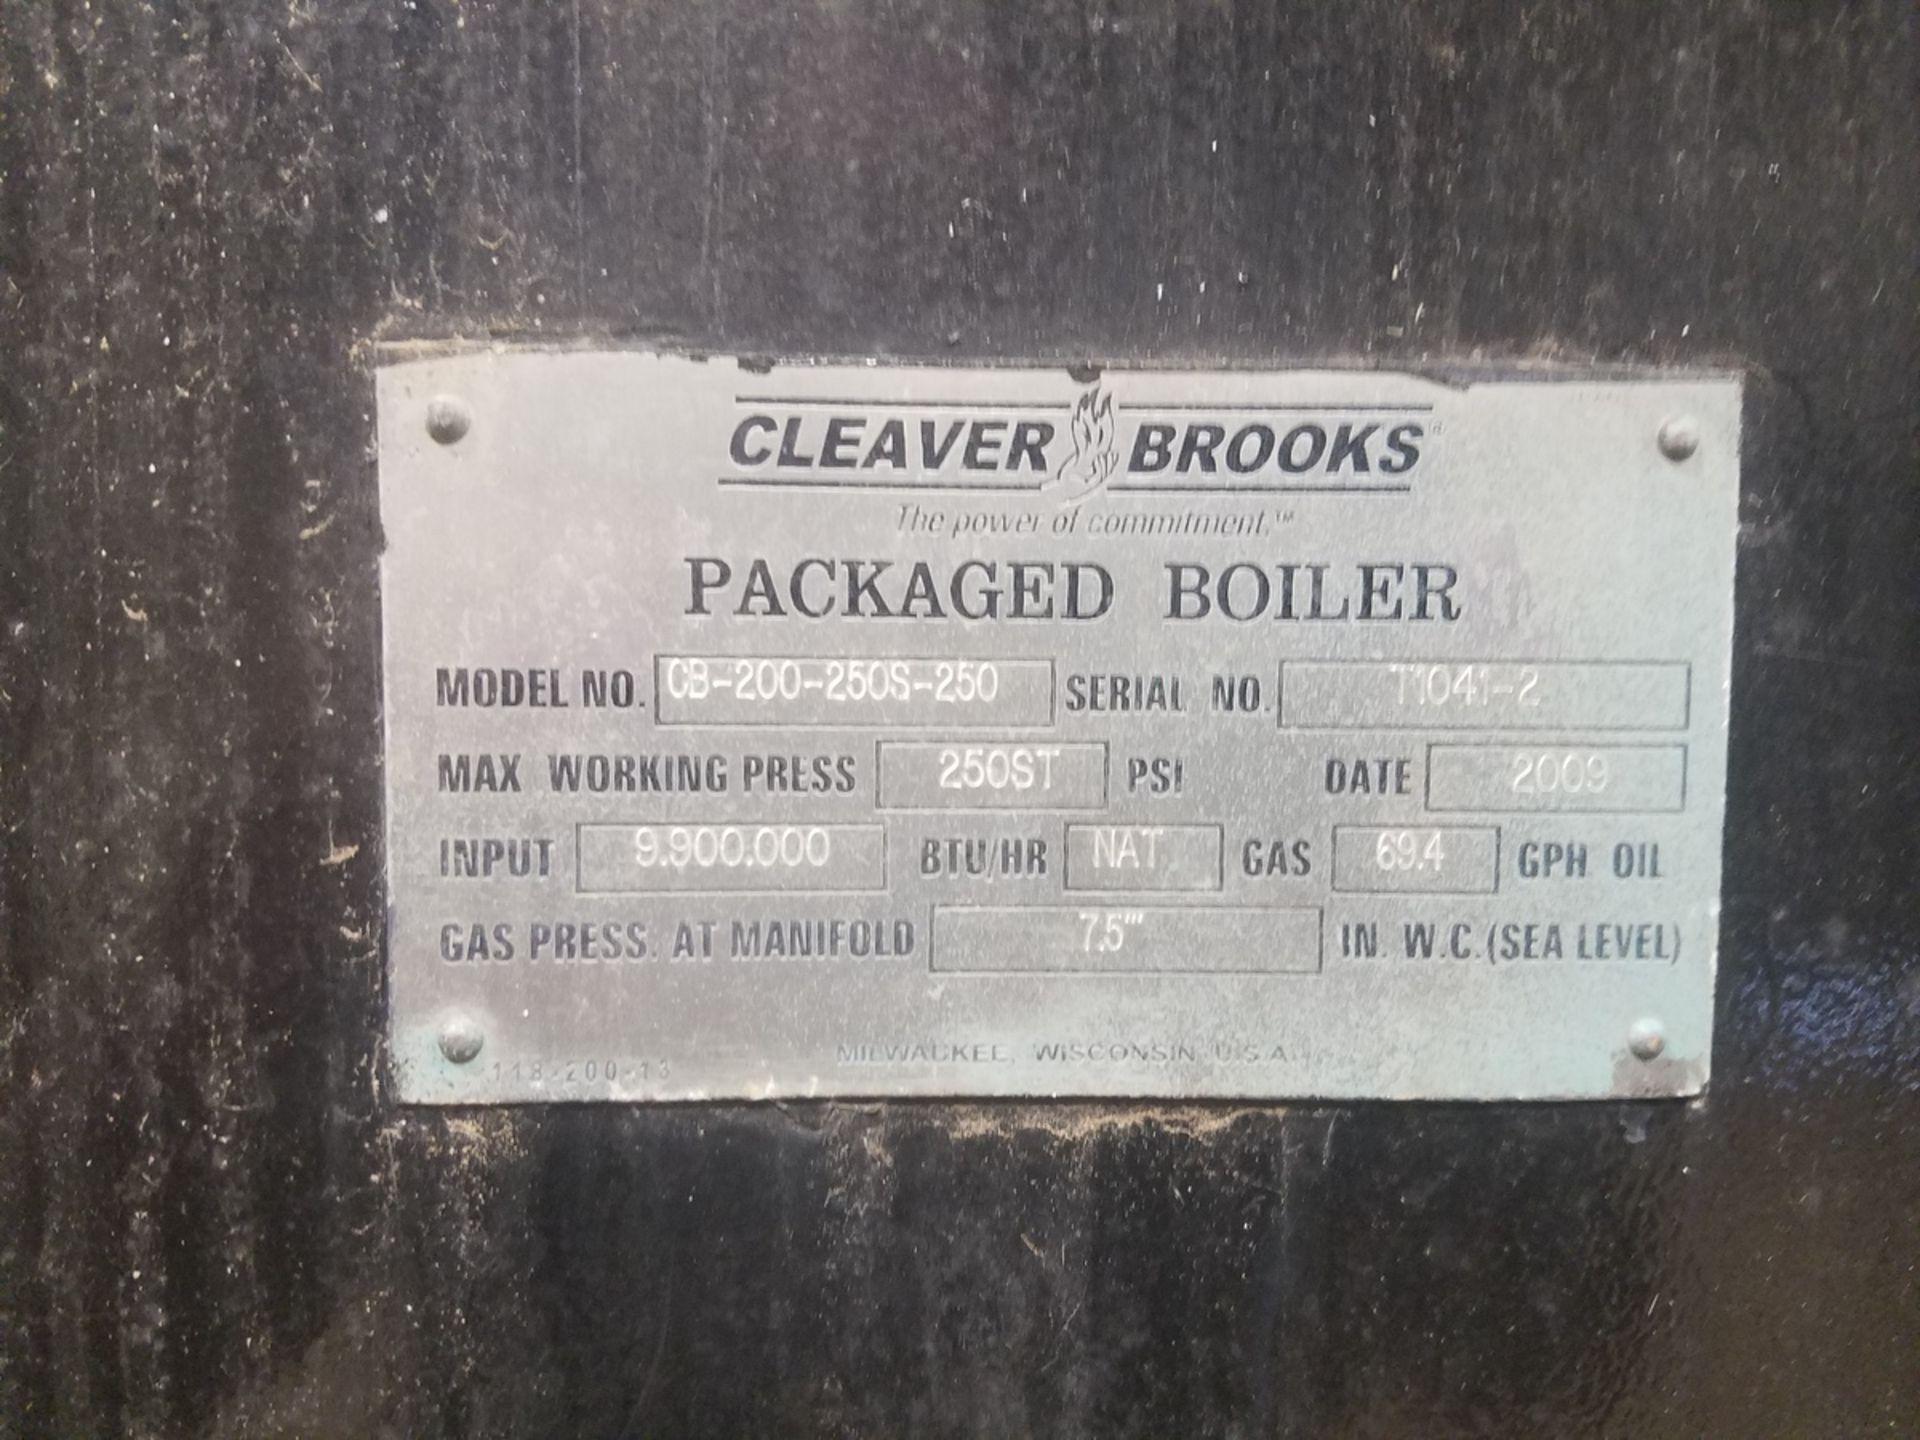 2009 (Rebuilt 2016) 250 HP Cleaver Brooks Boiler, 8.9 mmBTU, M# CB-200-250S-250, | Rig Fee: $5000 - Image 3 of 8